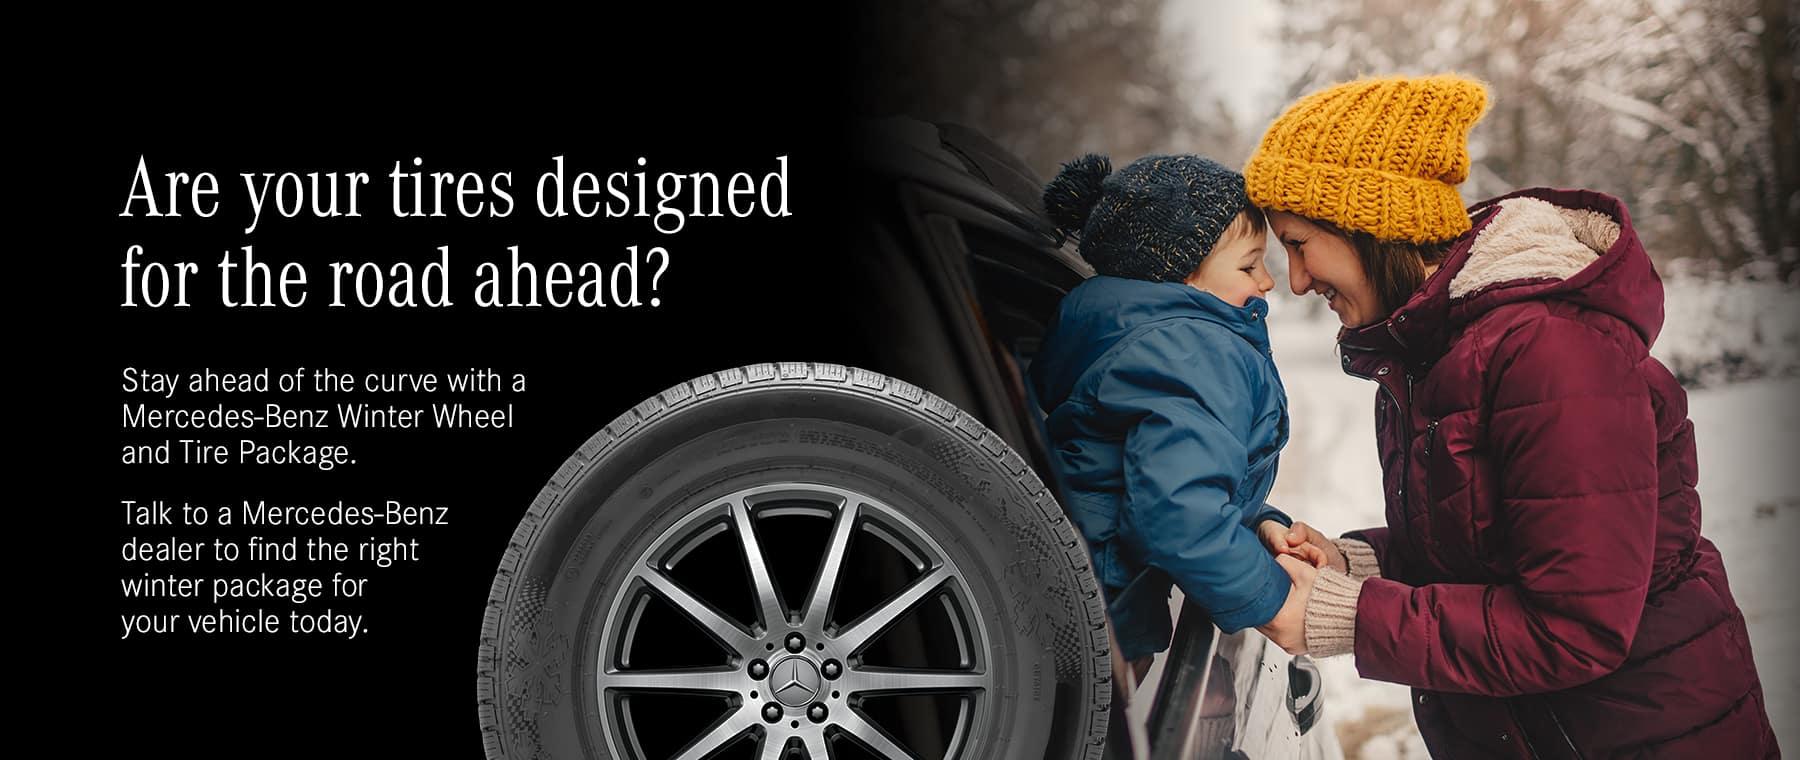 MBU_2020_Winter Wheel and Tire_Shift Web Banner_1800x760_VAR0